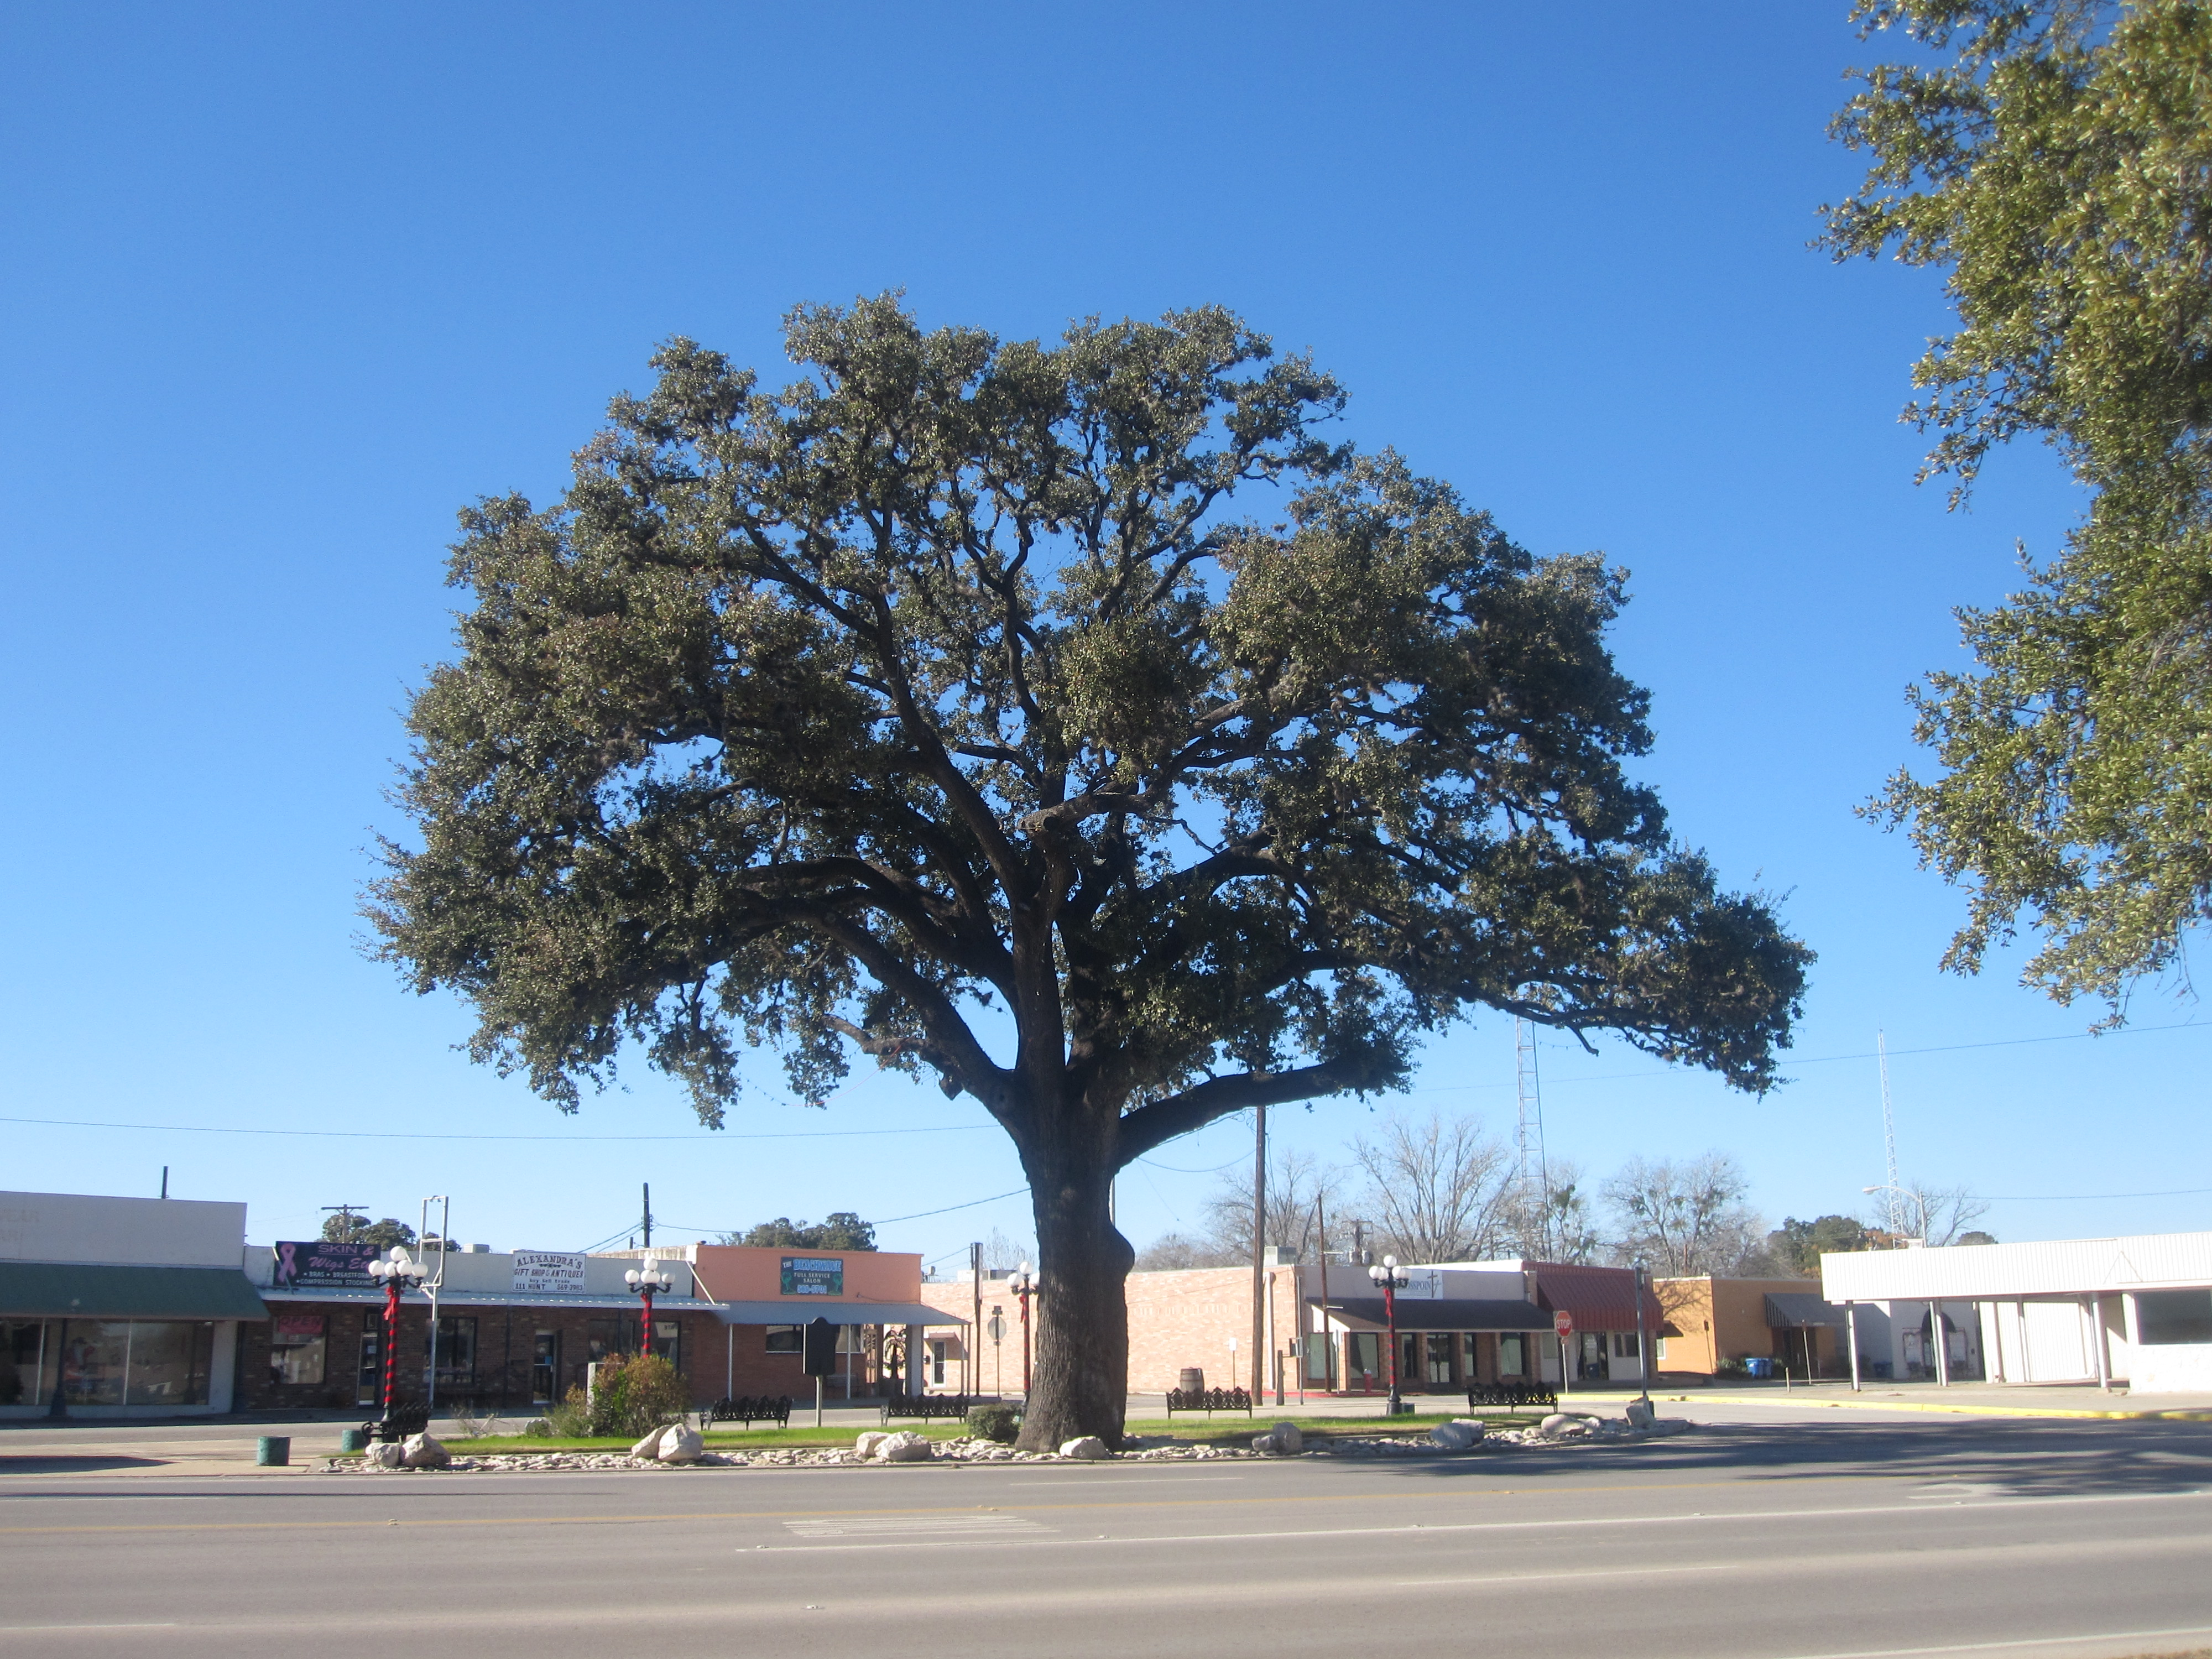 پیلیزنتون، تگزاس